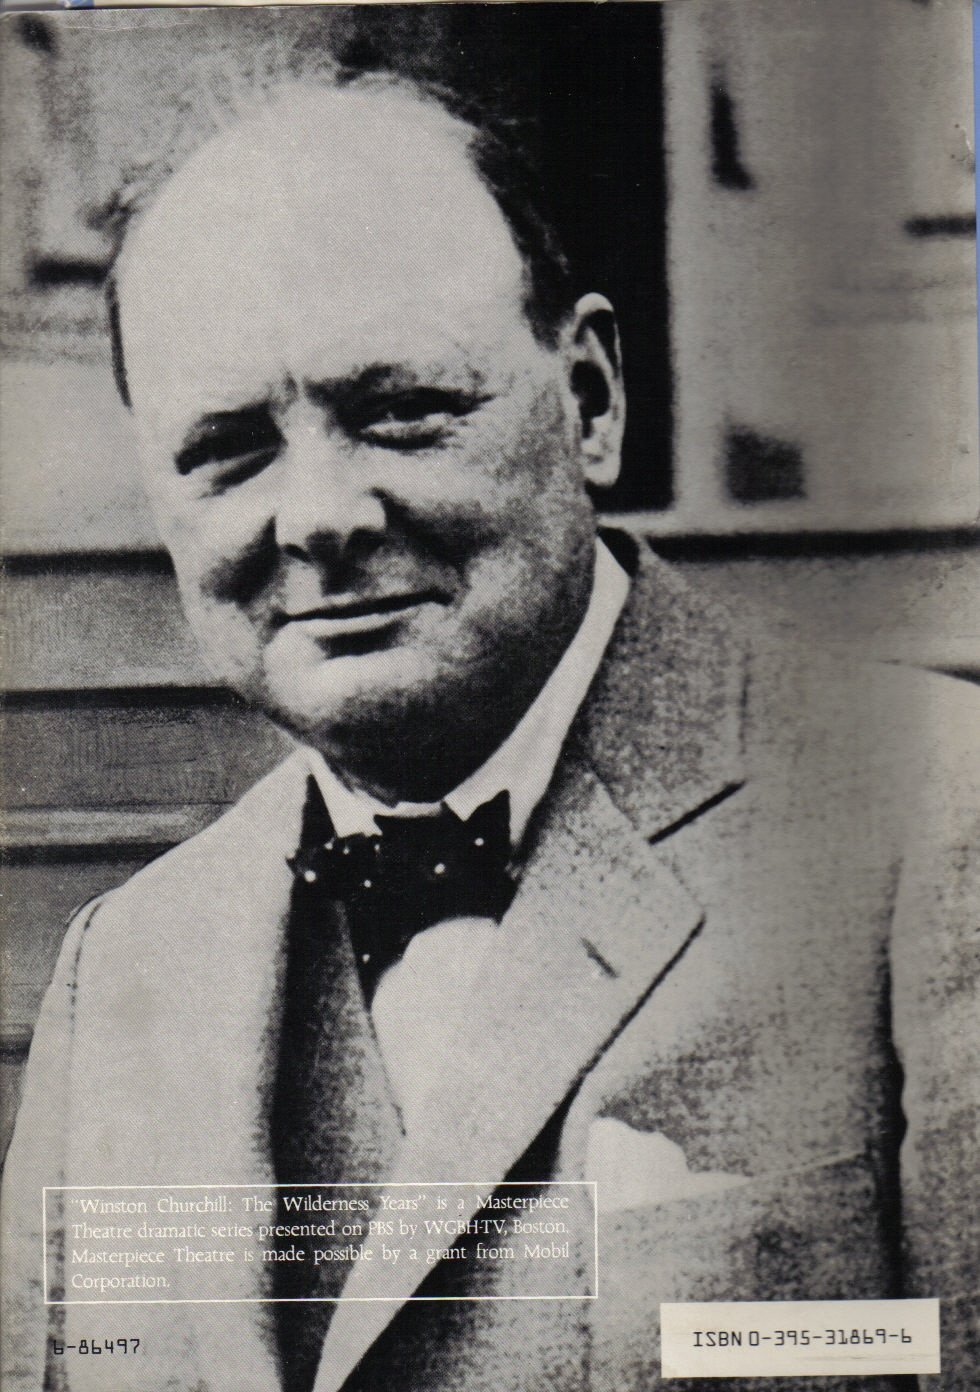 Amazon: Winston Churchill: The Wilderness Years (9780395318690): Martin  Gilbert: Books